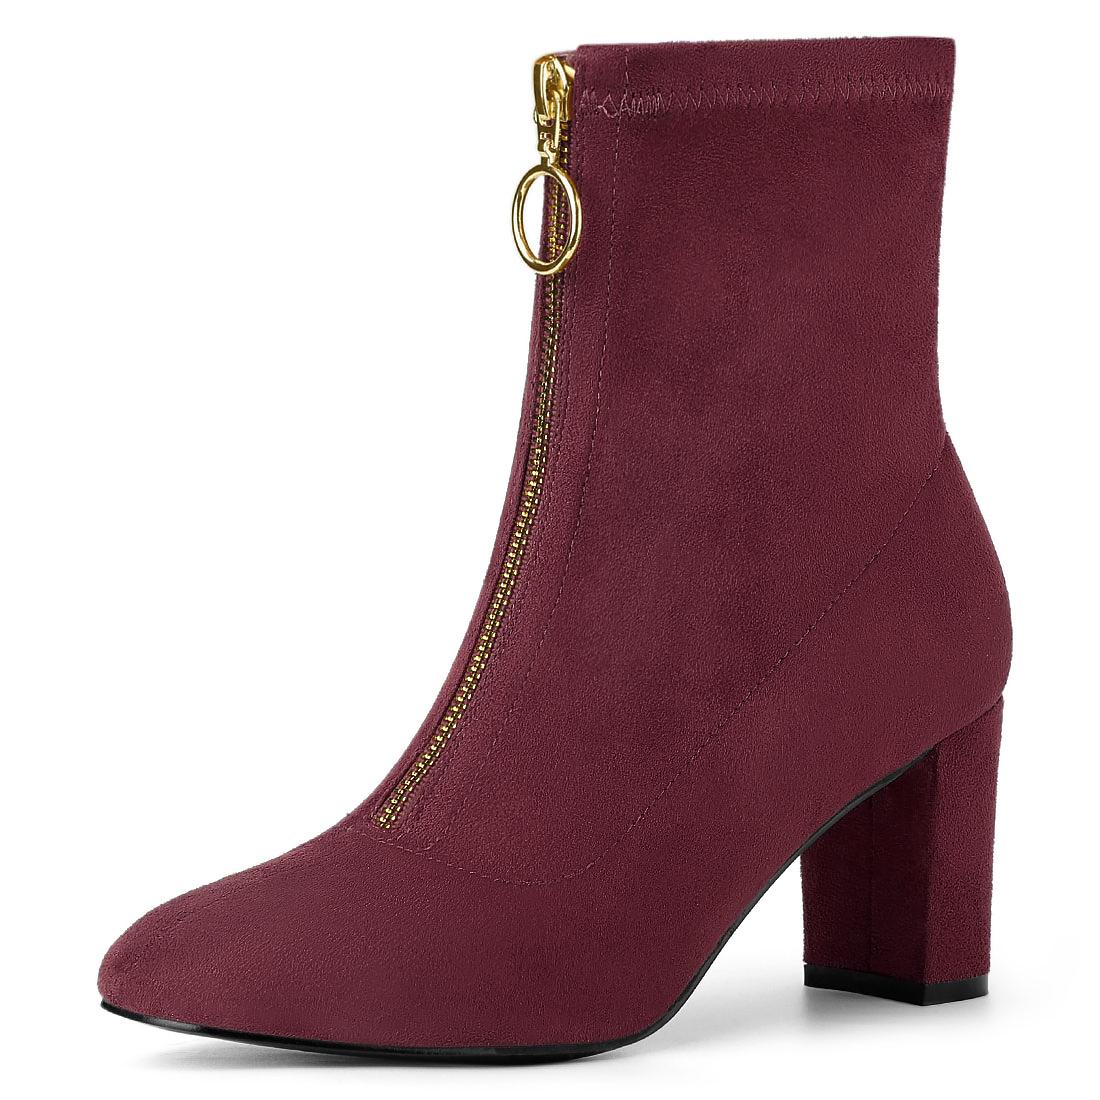 Allegra K Women's Front Zipper Chunky Heel Ankle Boots Burgundy US 7